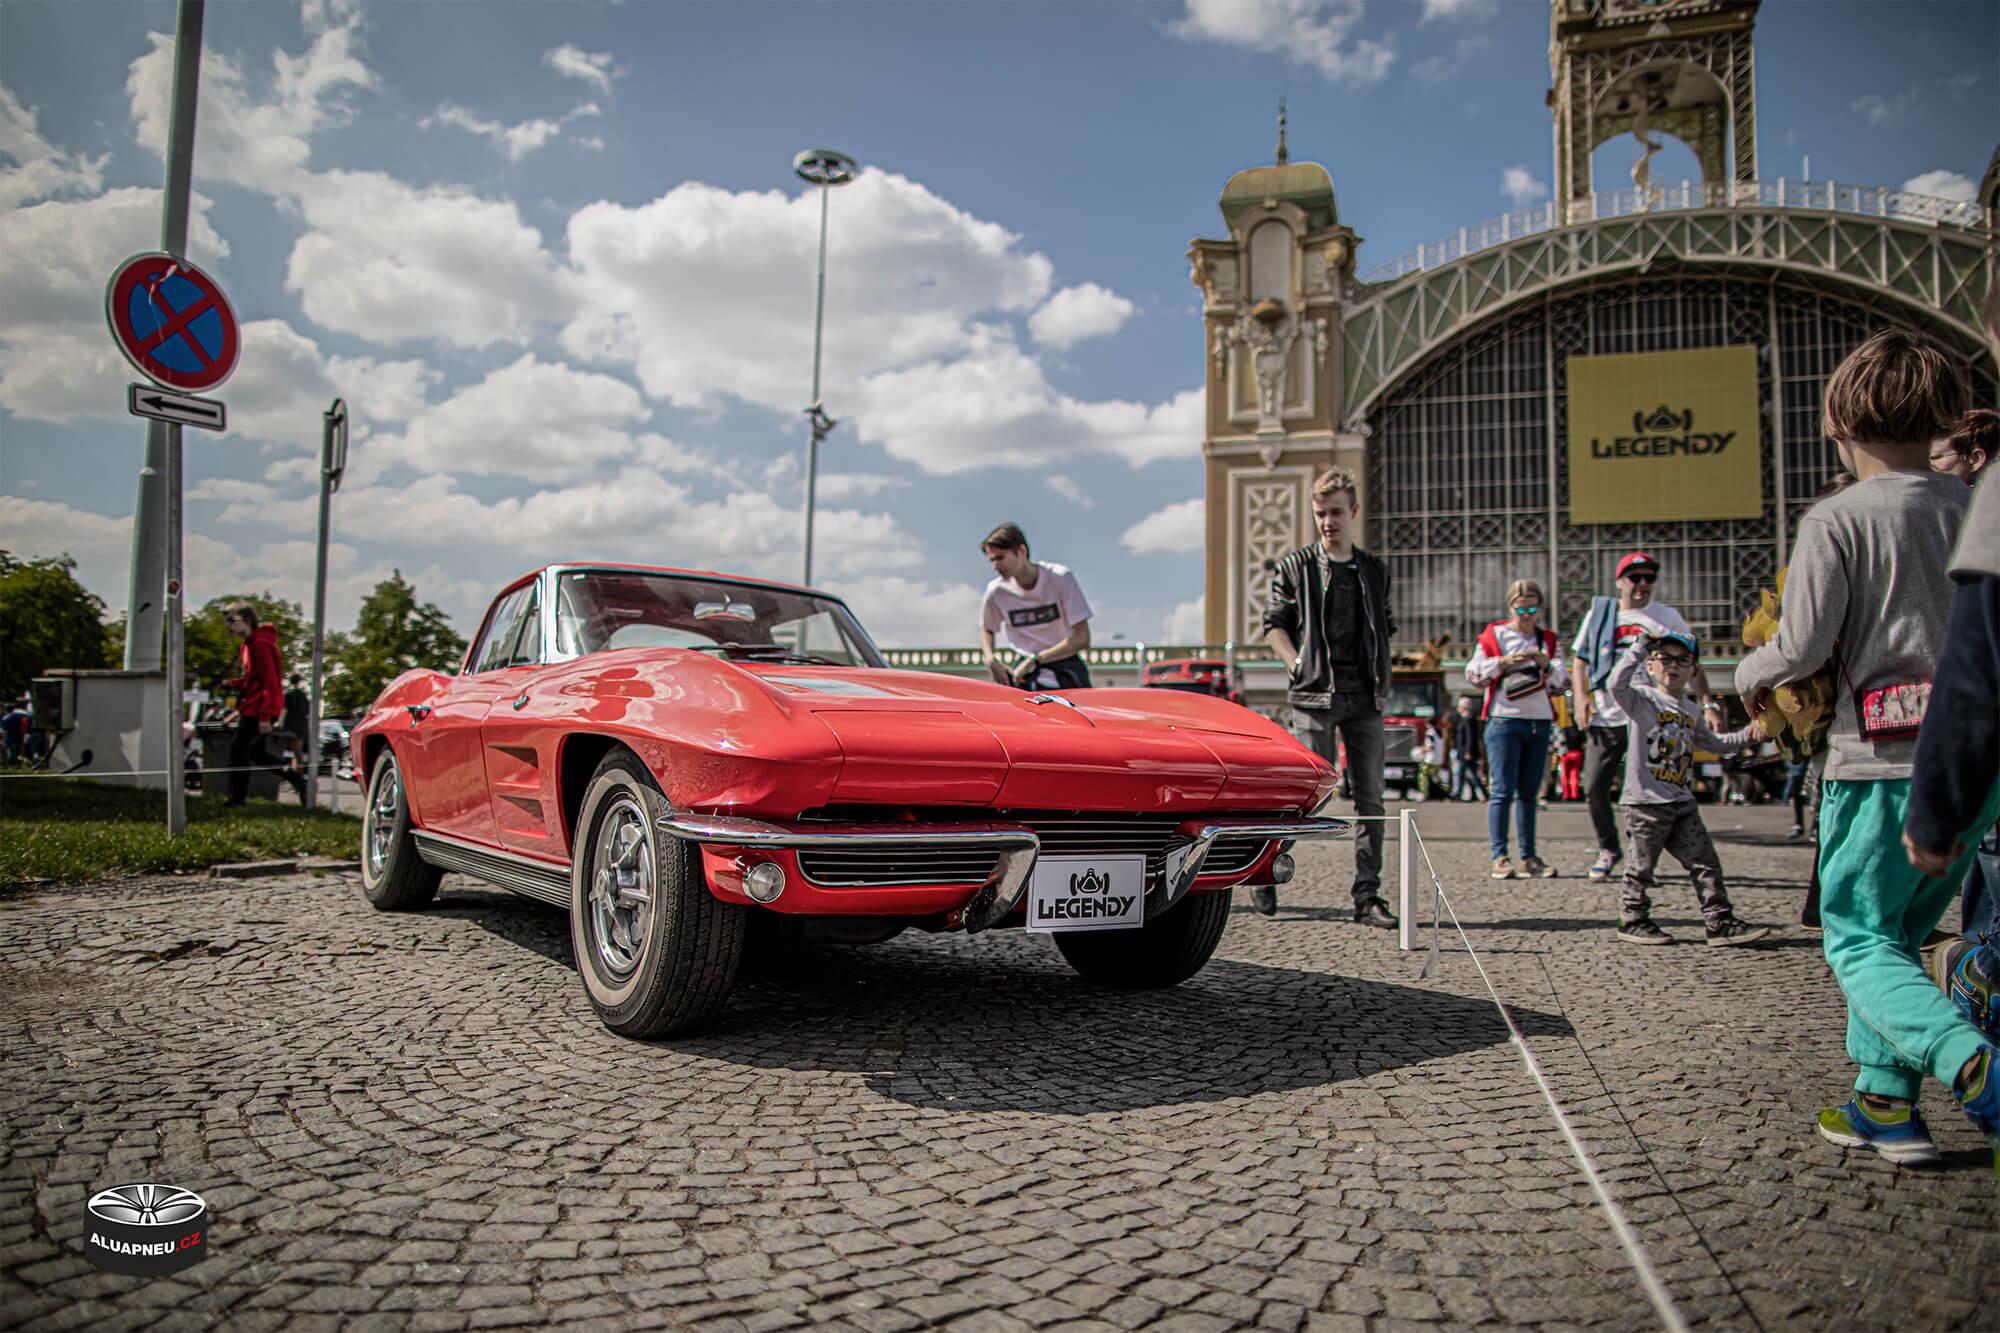 Chevrolet - Youngtimer - www.aluapneu.cz